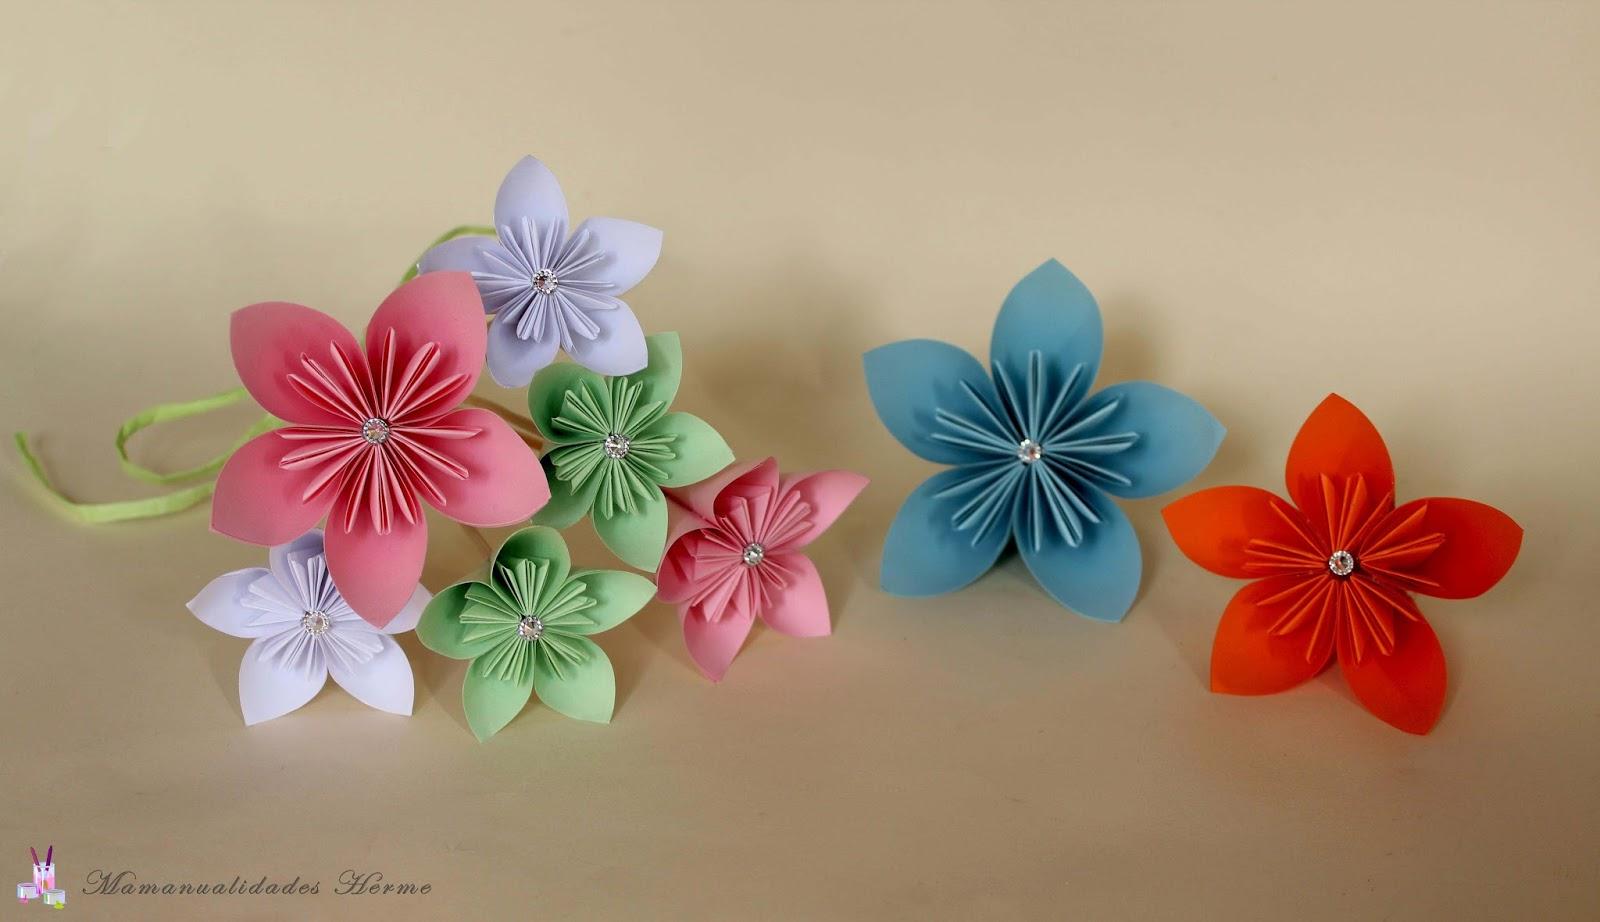 Manualidades herme como hacer flores kusudama - Ver como hacer manualidades ...